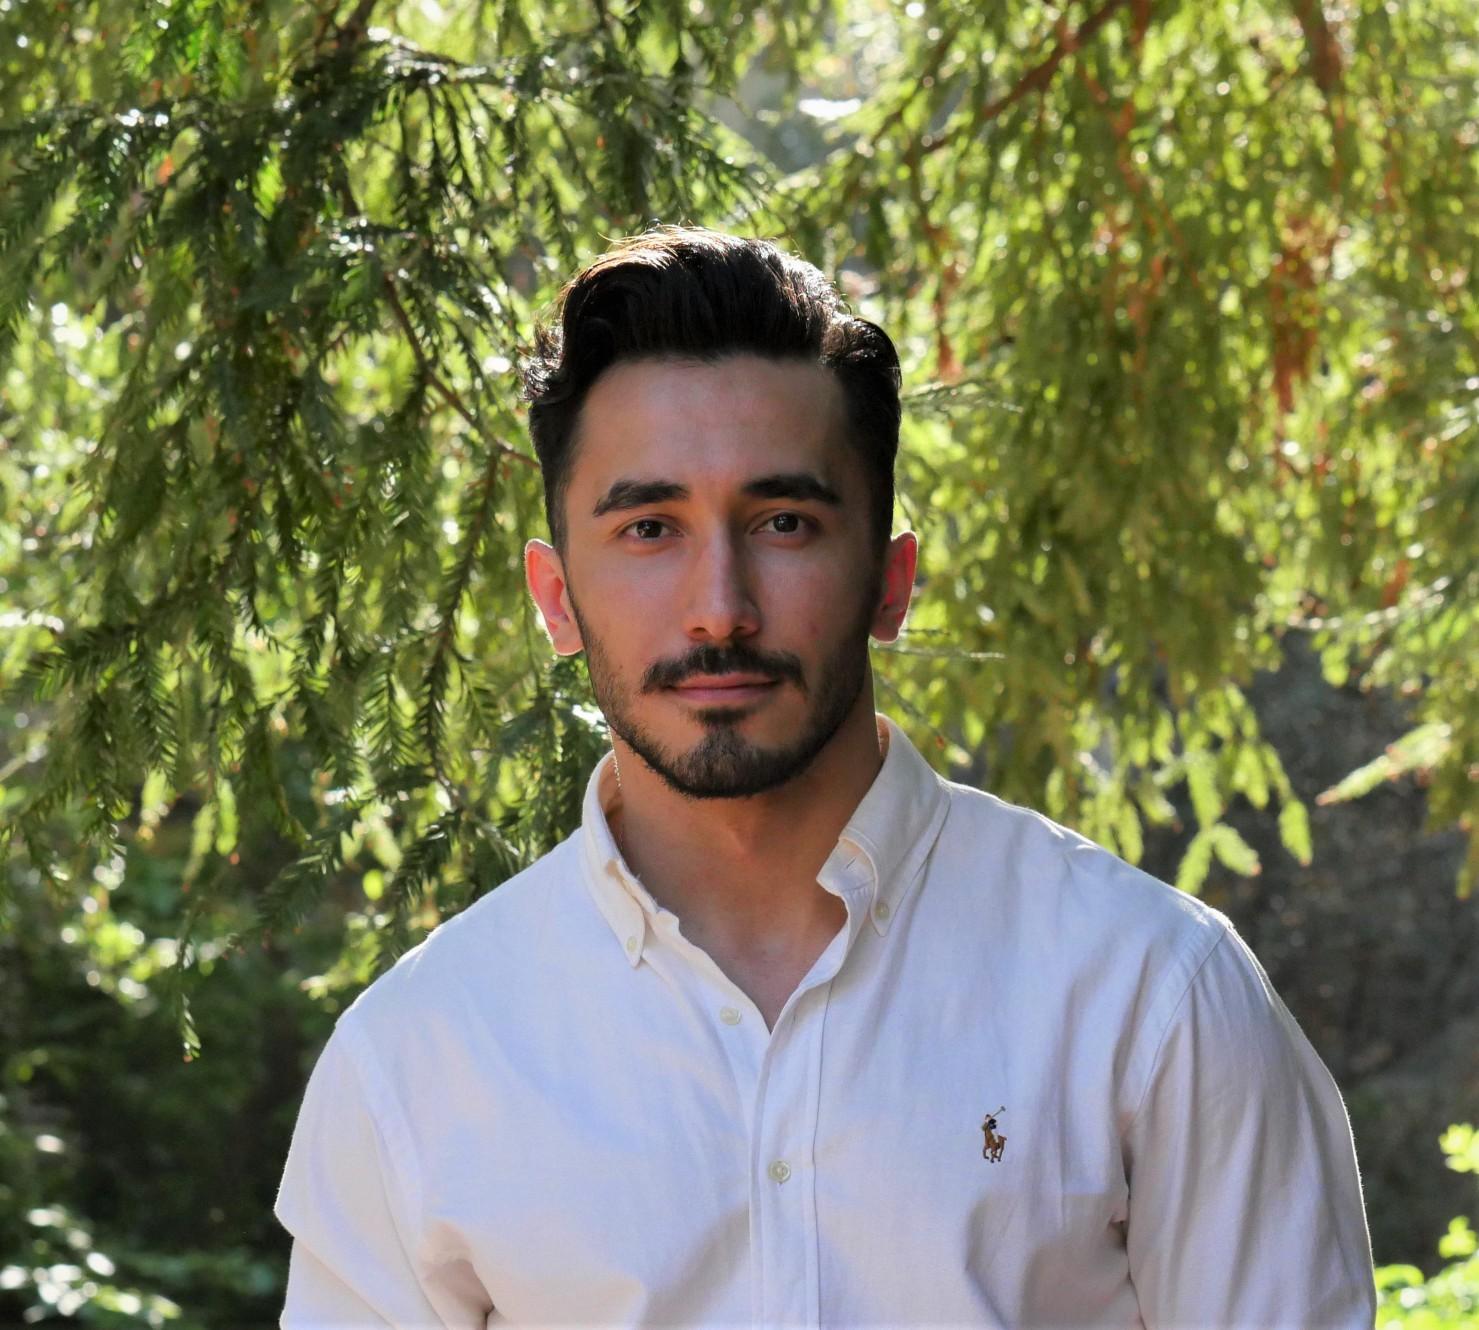 Arman Babakhani